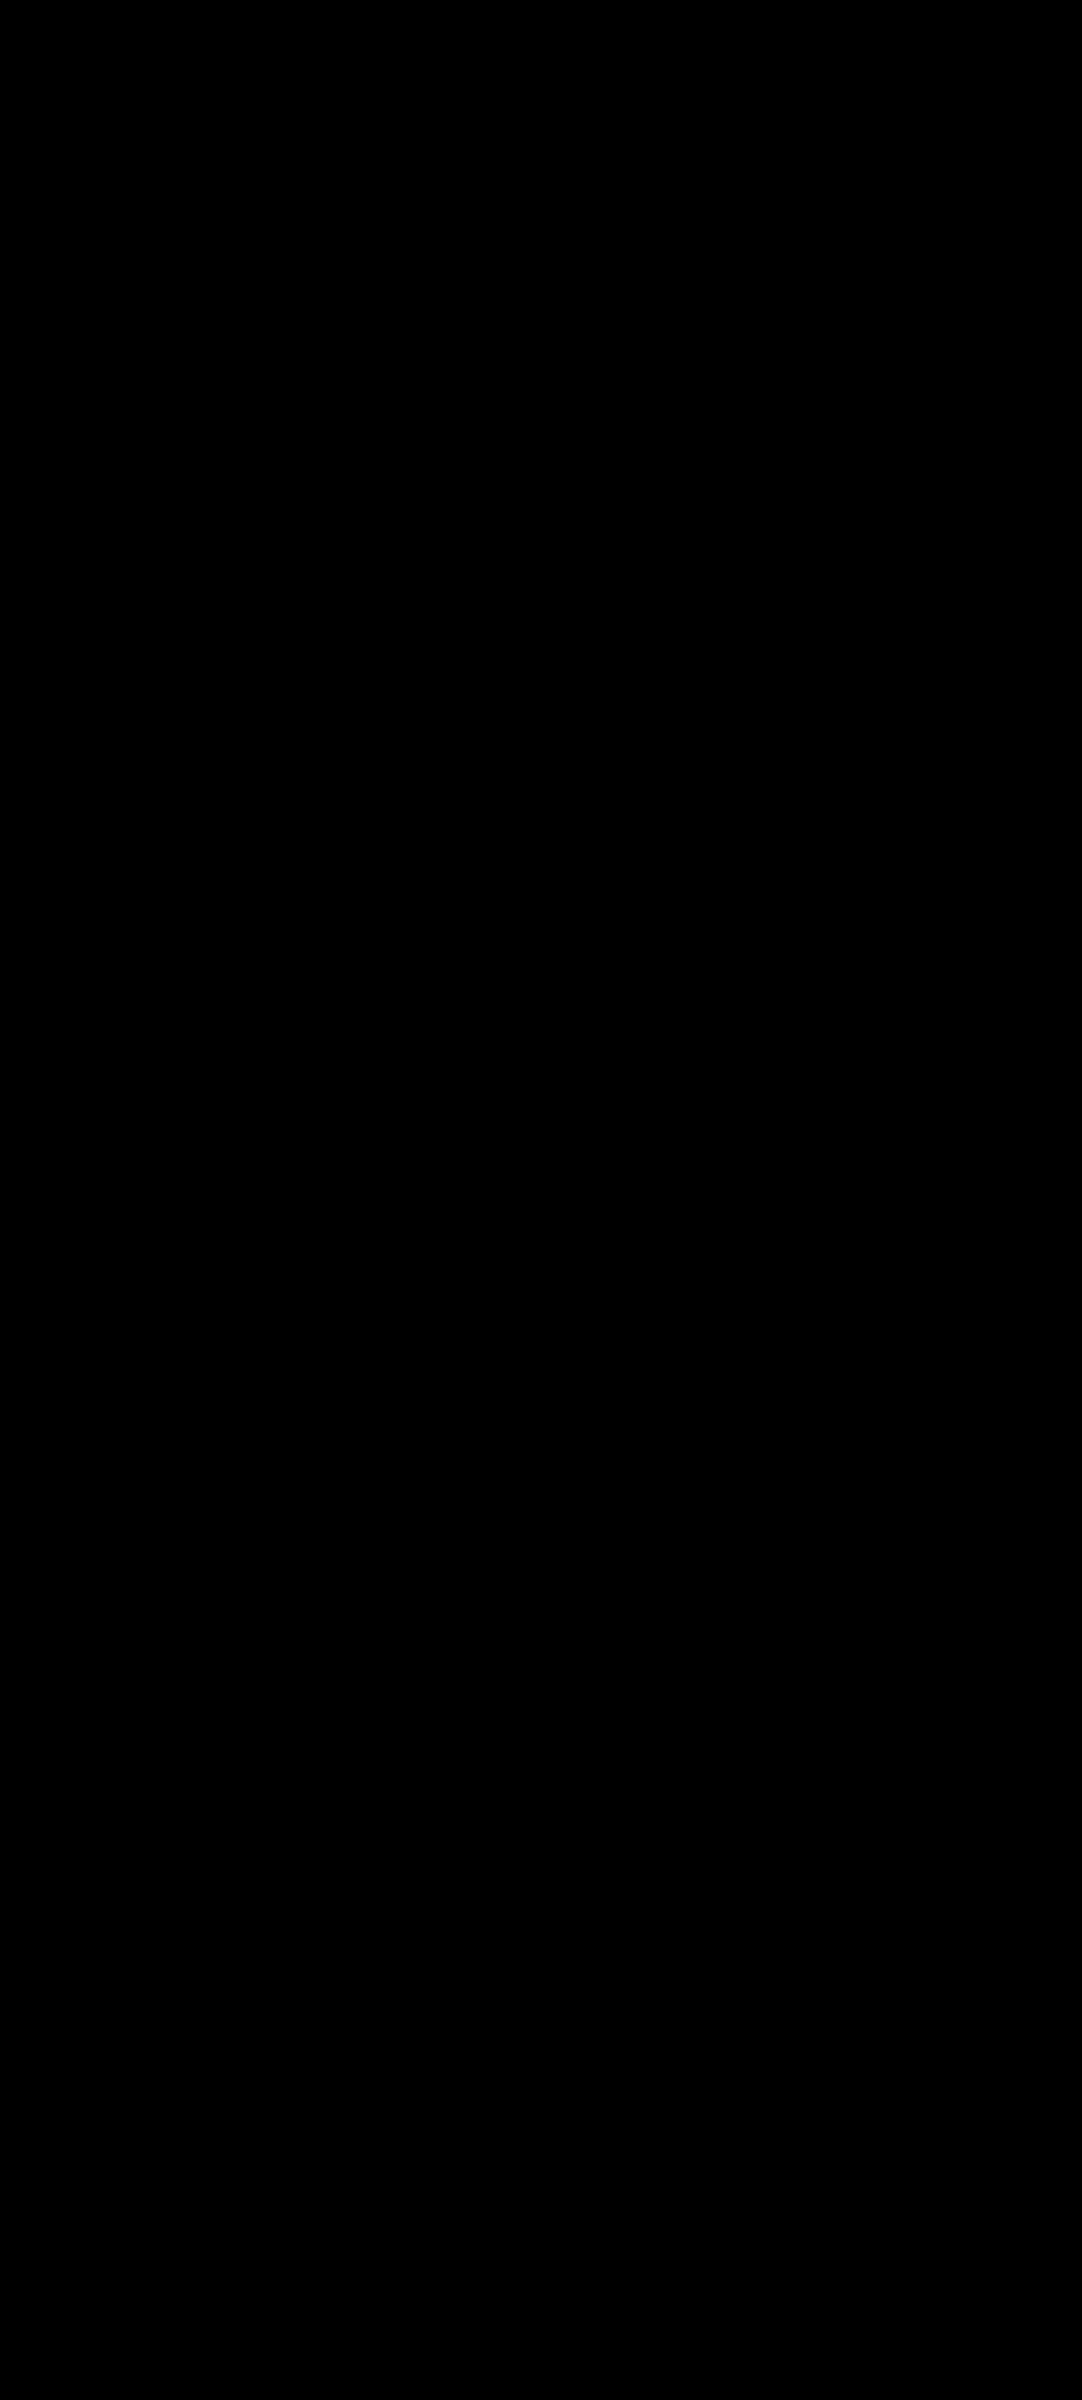 Dance clipart symbol. Disco dancer big image